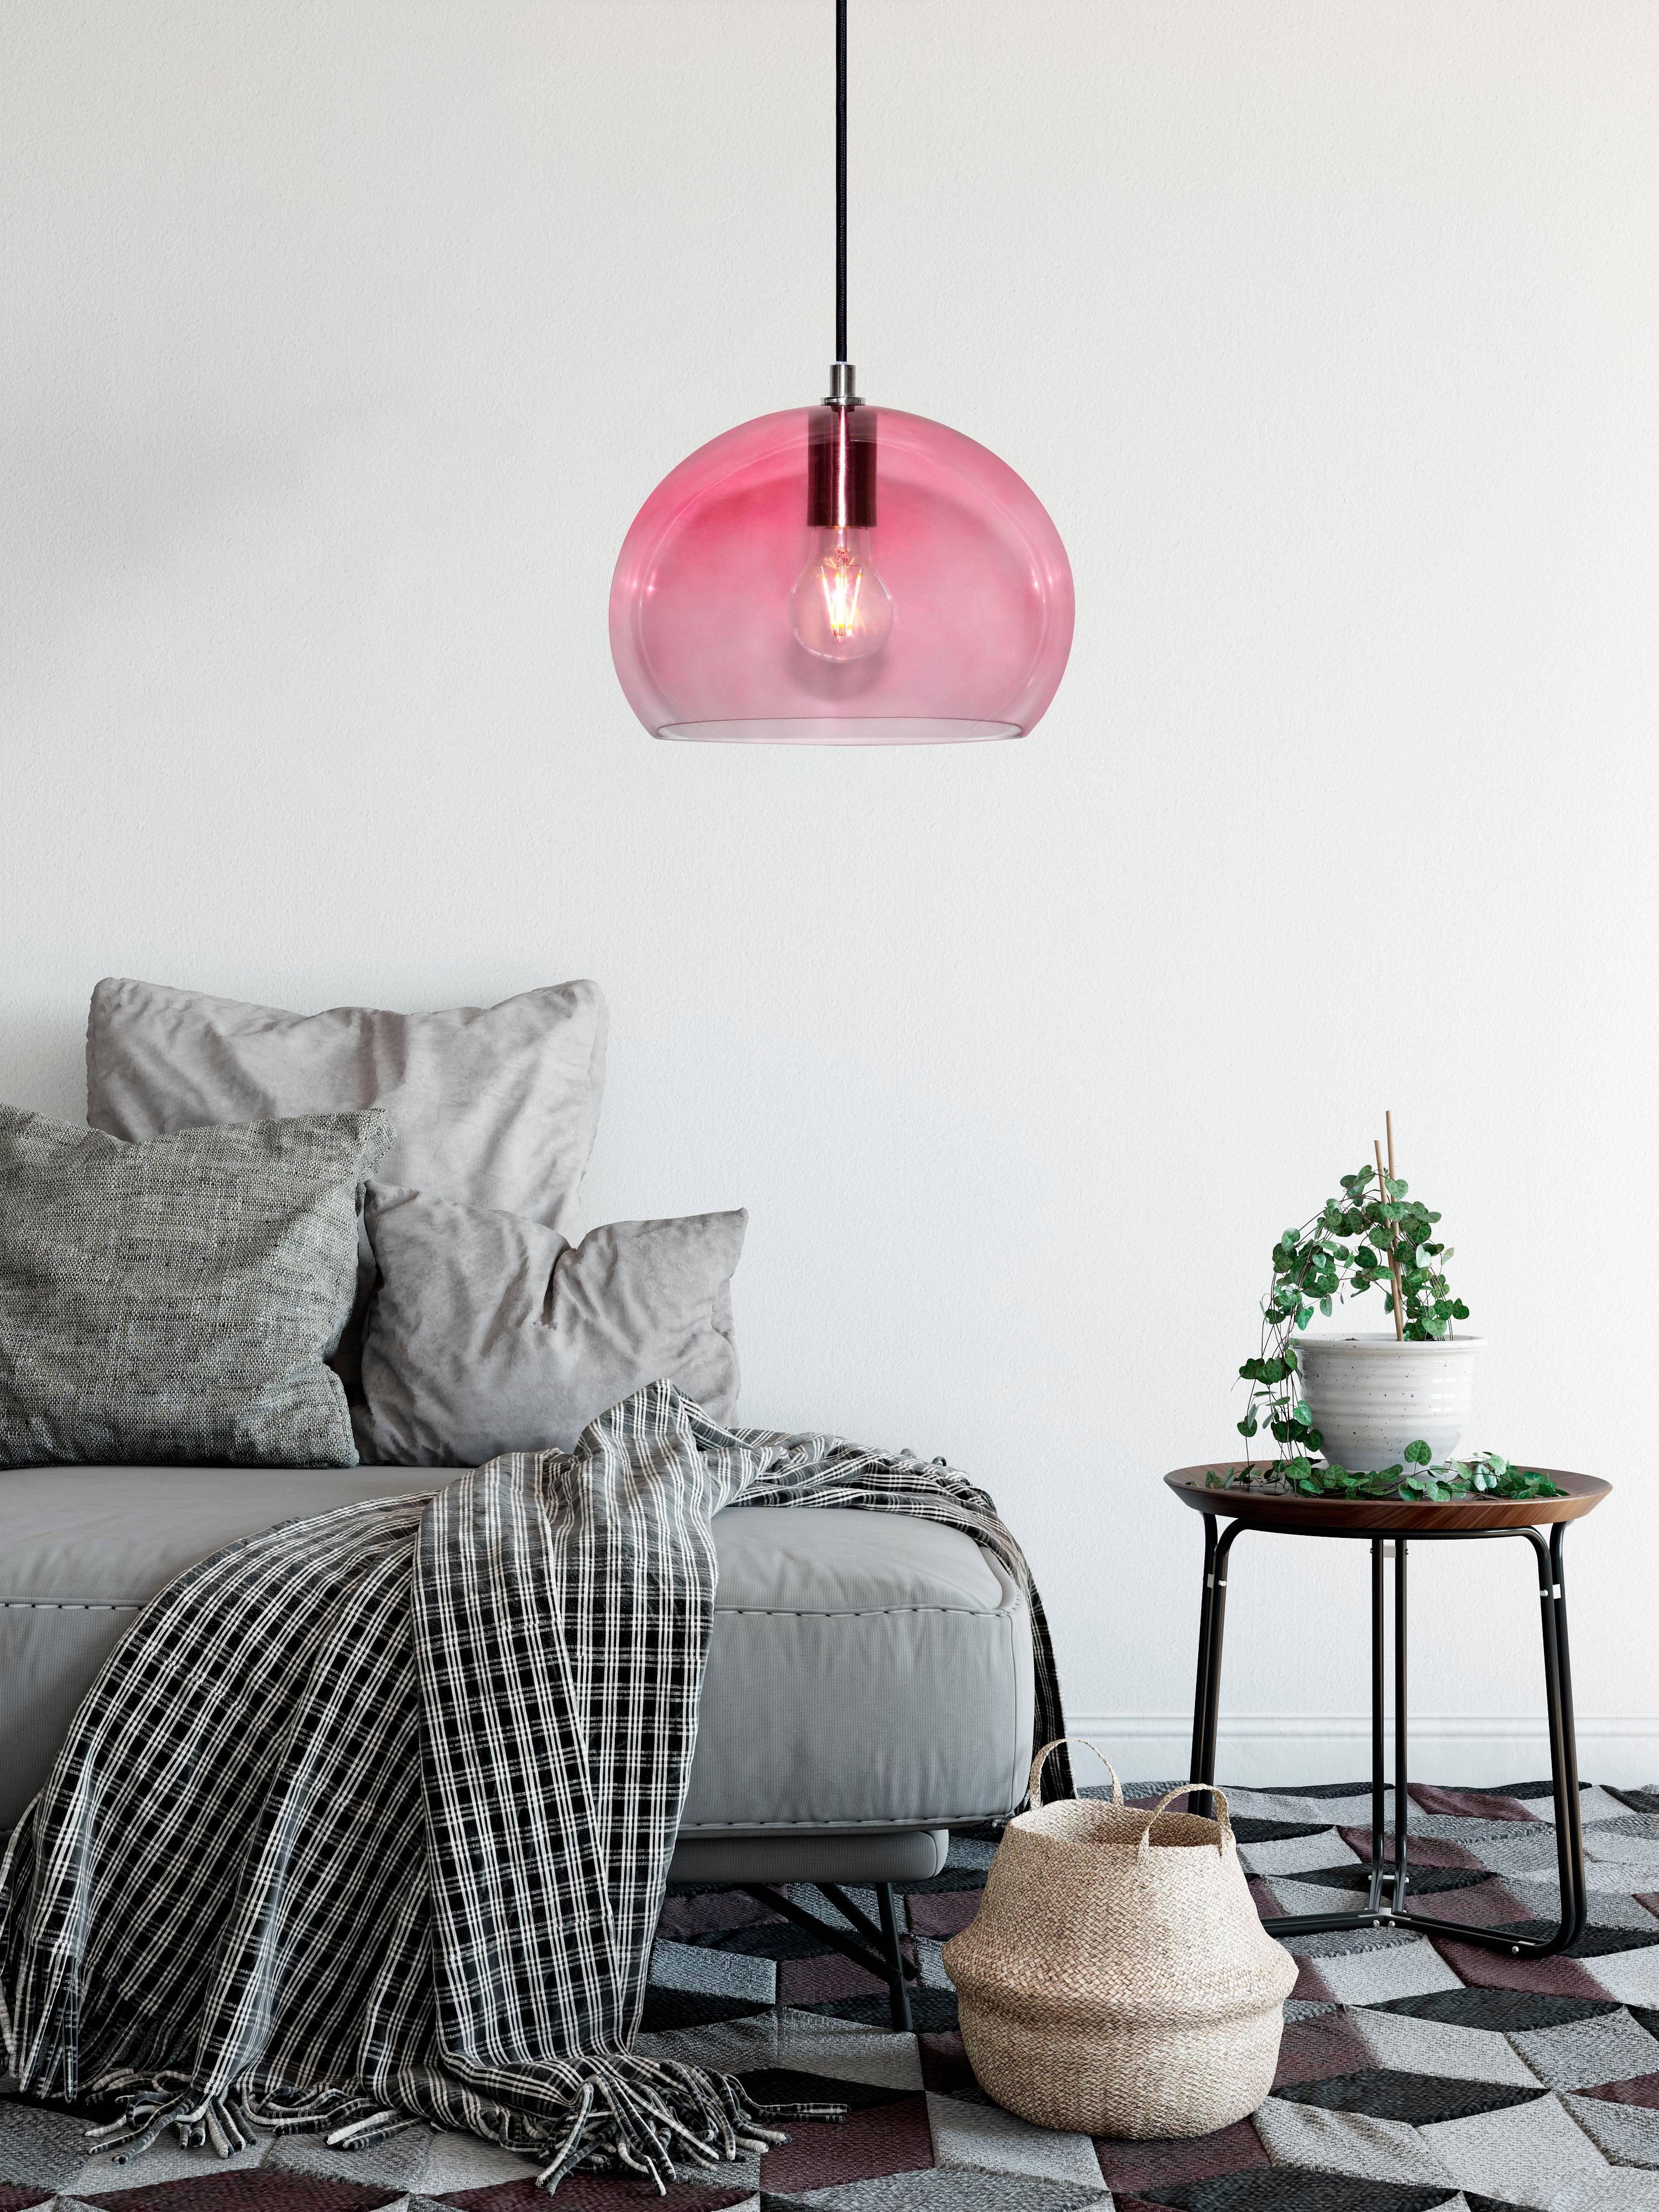 Lighting By Havso Loftlampe Smoky Rosa Belysning Homeroom Dk